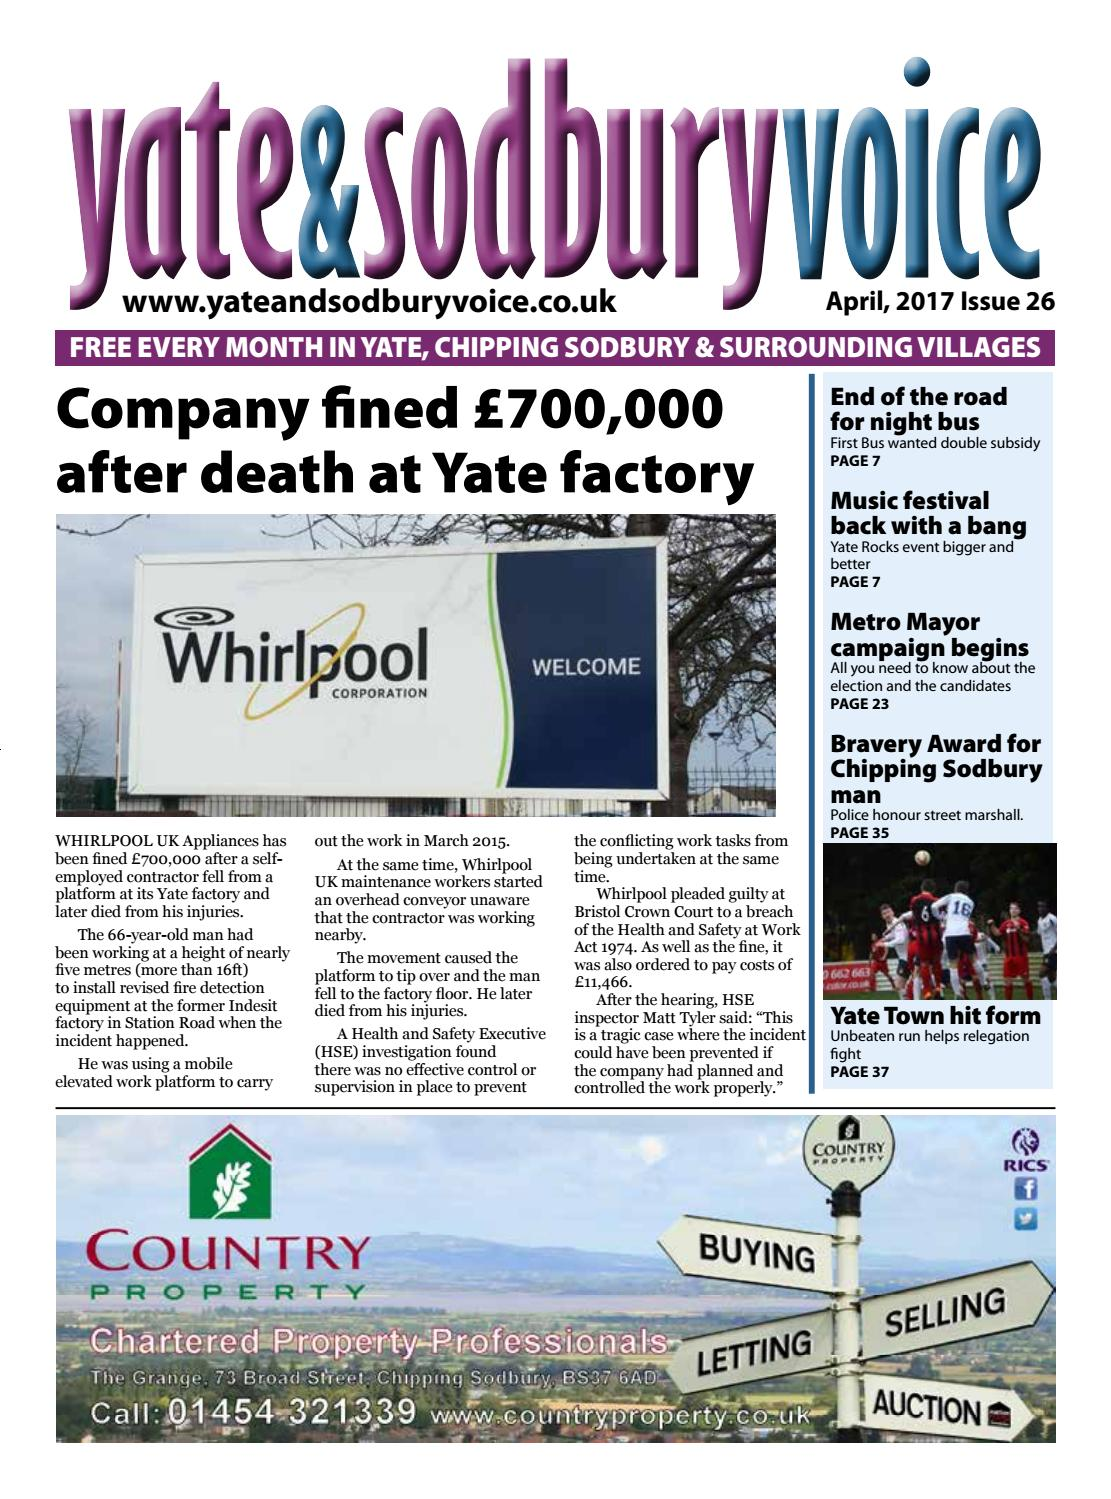 Betting shop chipping sodbury festival commercenet investment initiatives synonym